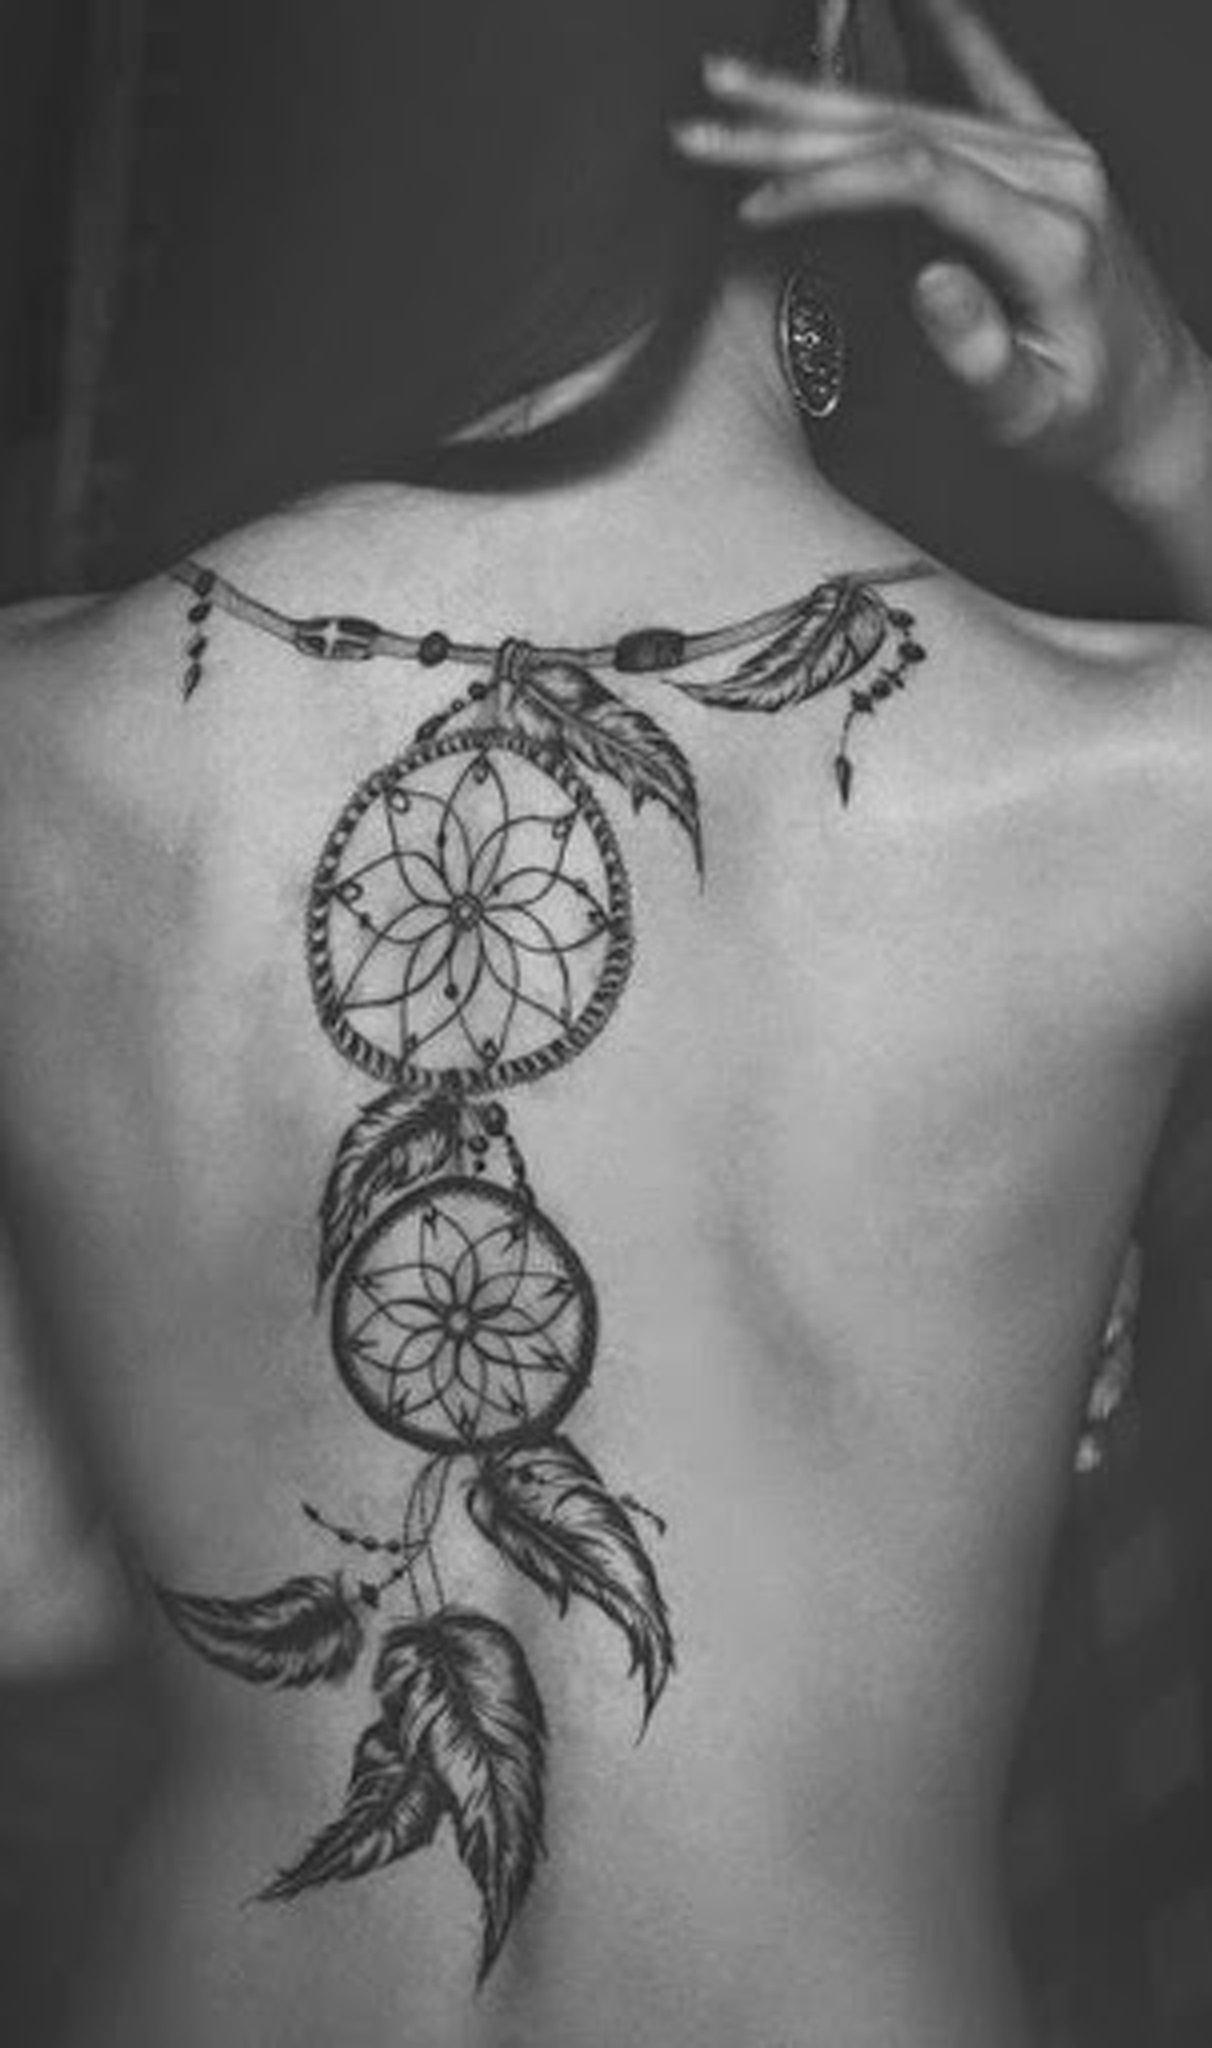 Spine Tattoo (3)